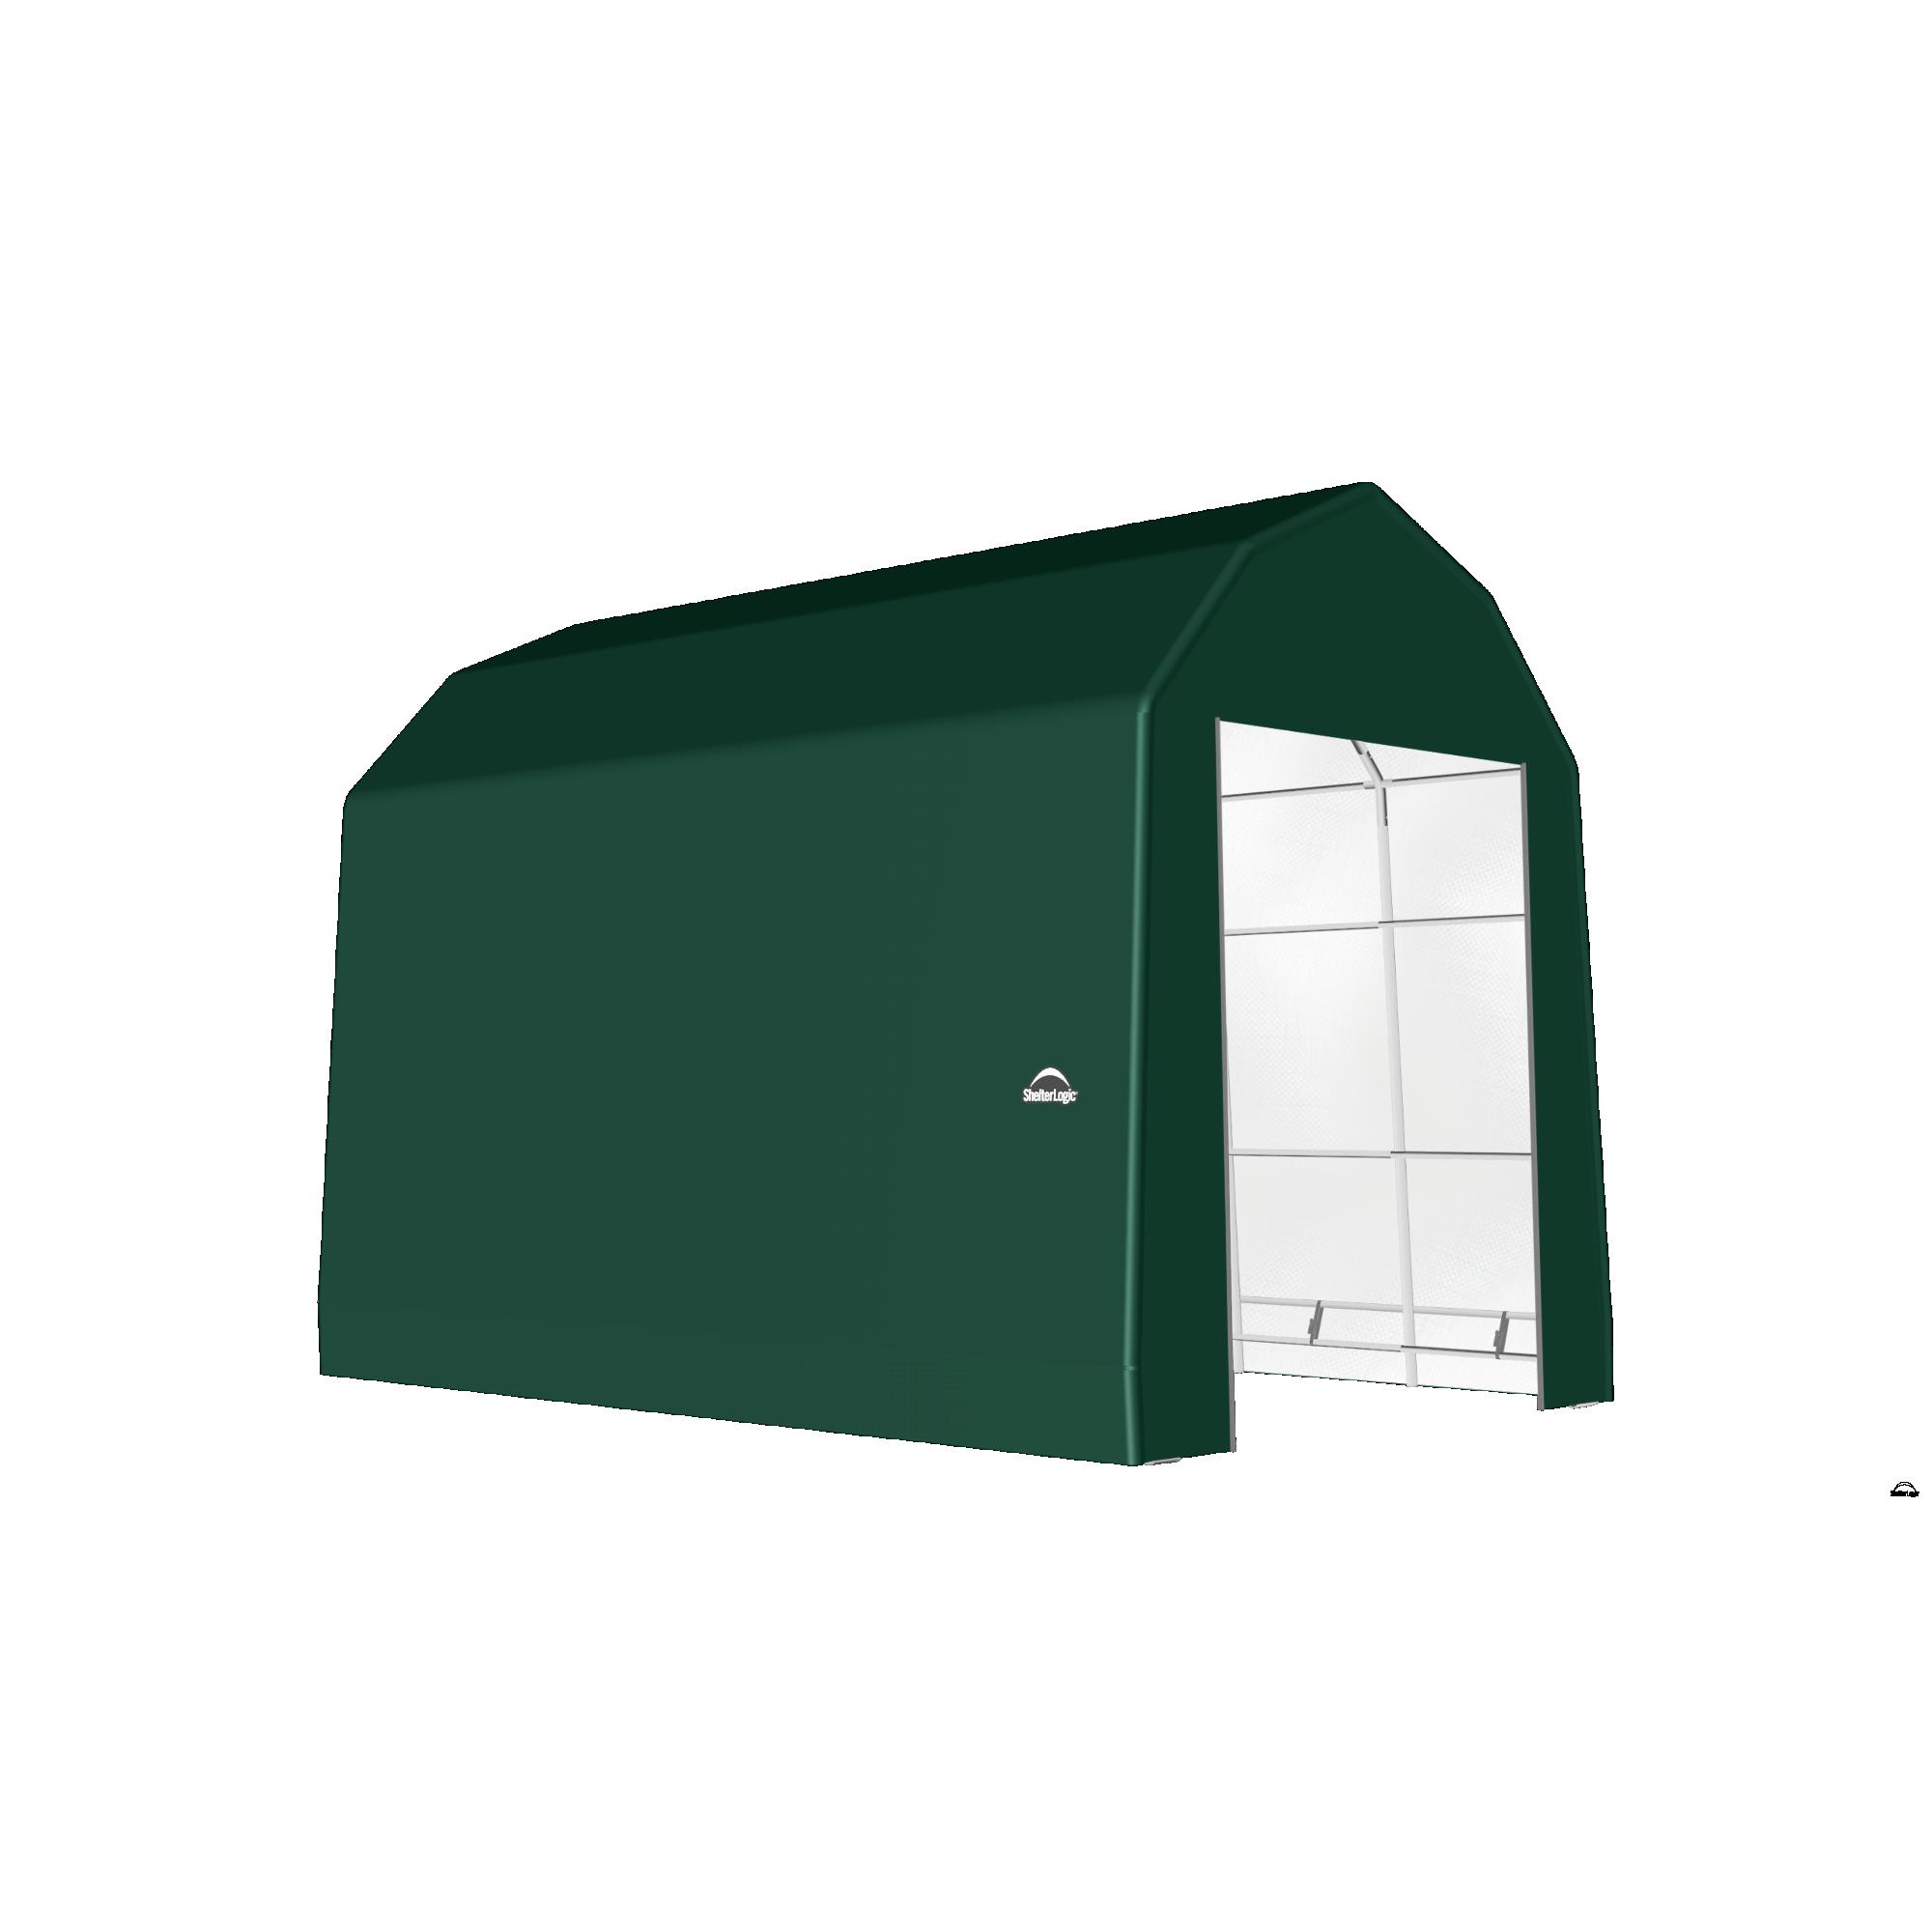 SP Barn 15X24X17 Green 14 oz PE Shelter